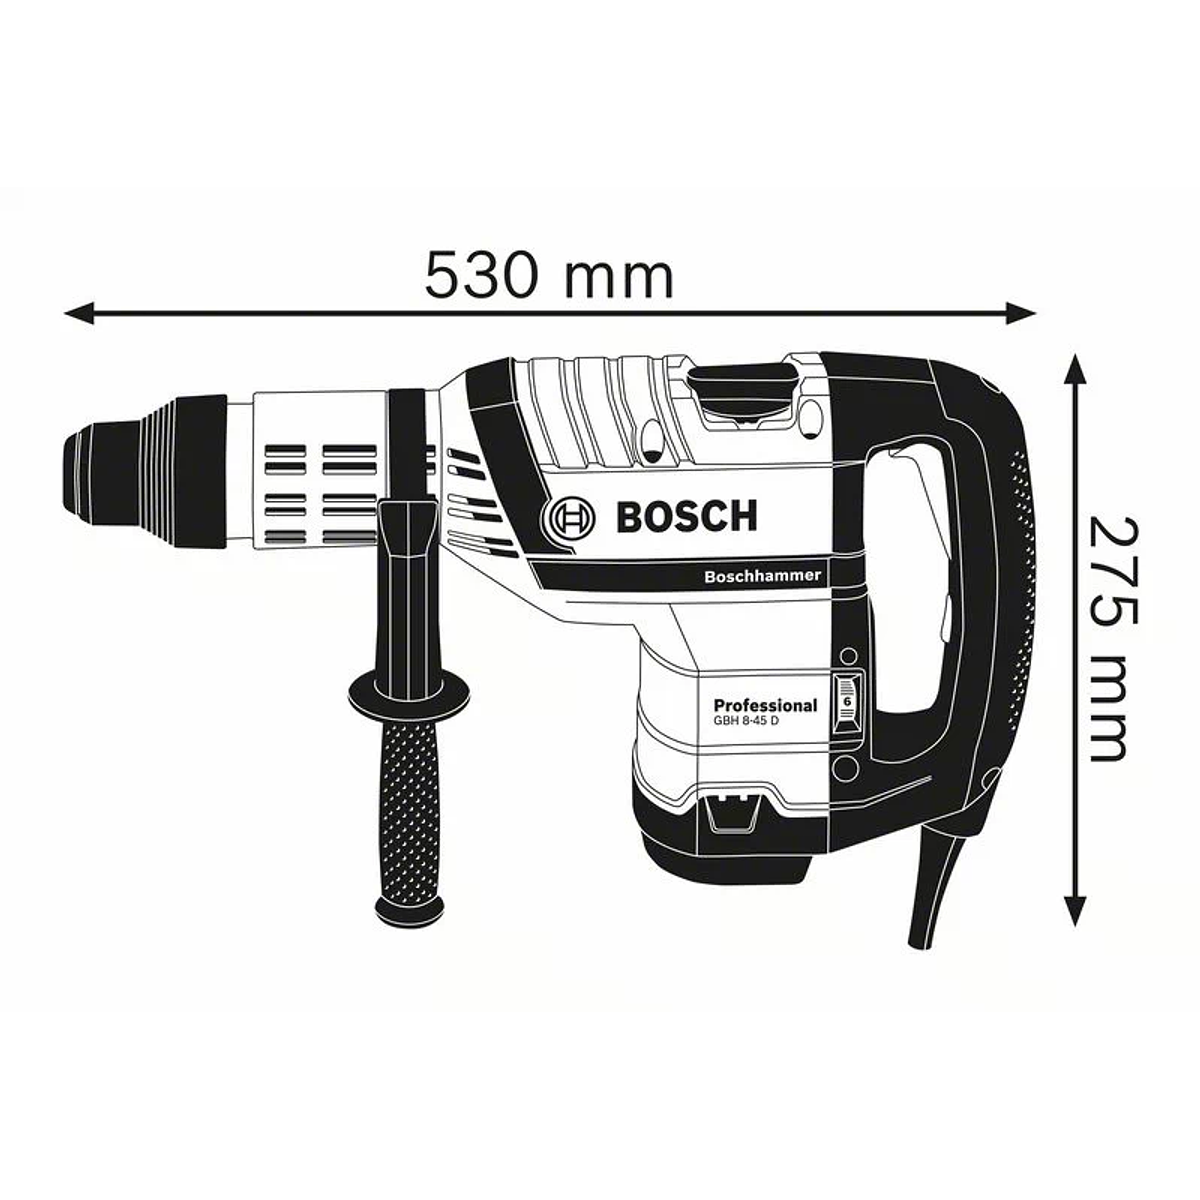 Martelo perfurador SDS Max GBH 8-45 D BOSCH